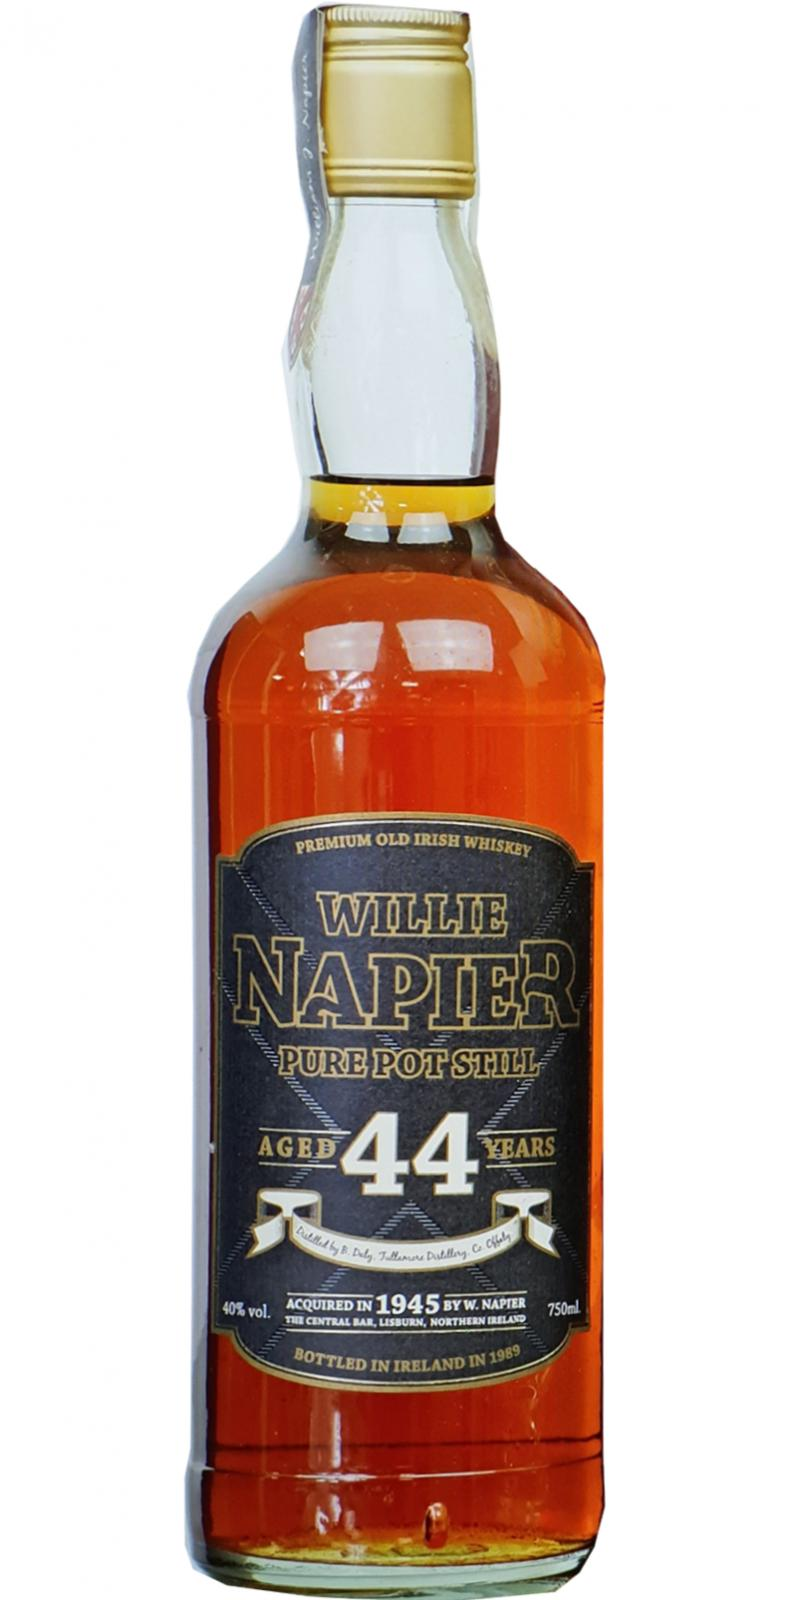 Tullamore Dew 1945 Willie Napier